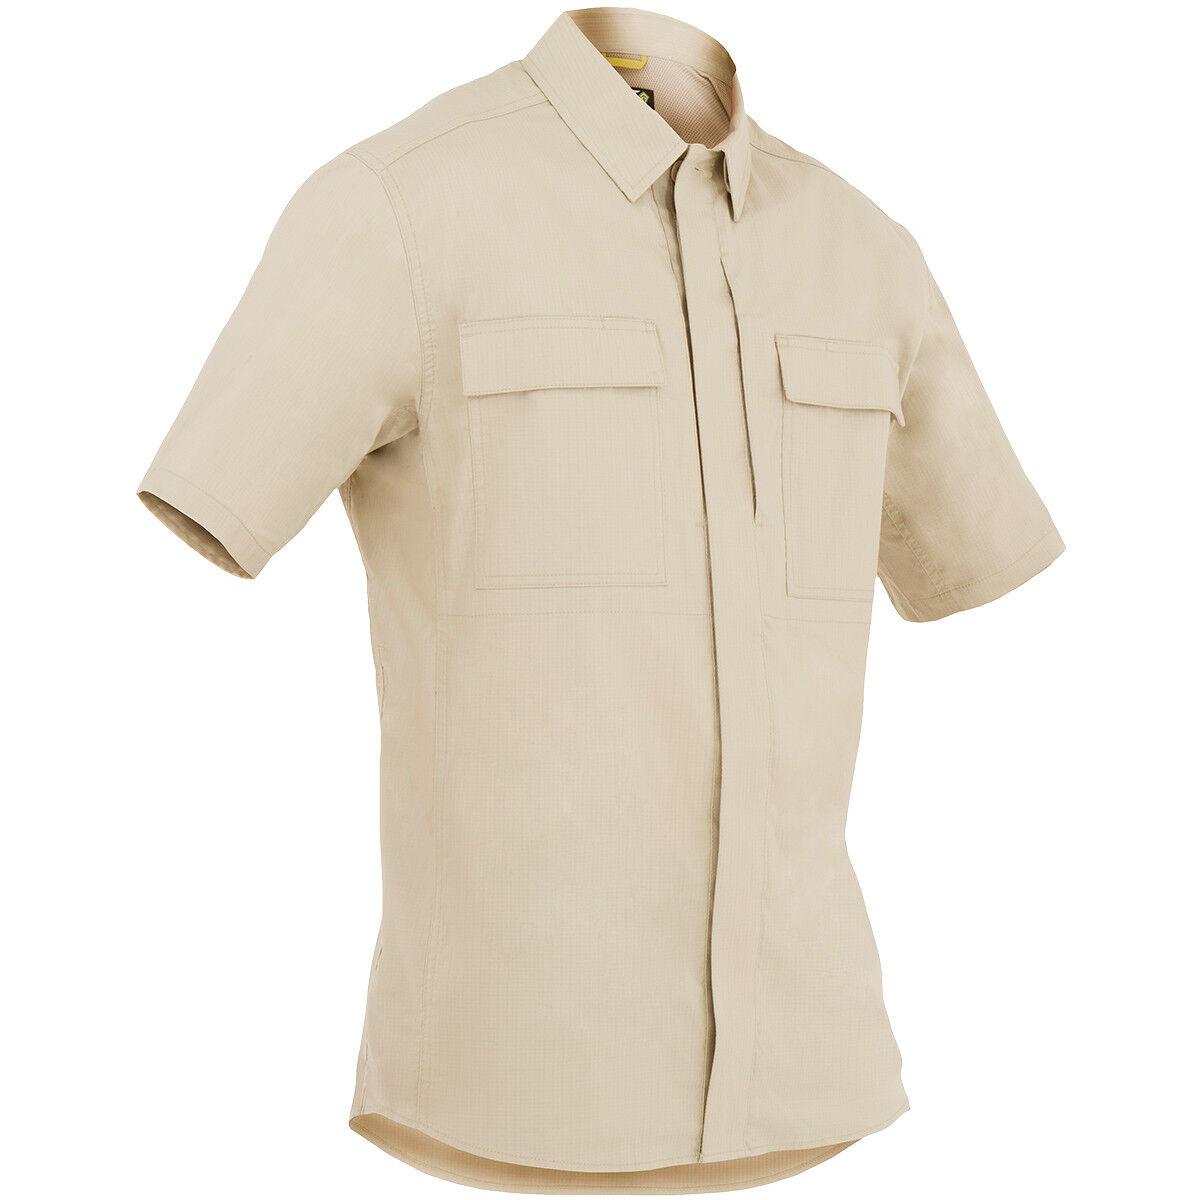 First Tactical Mens Specialist Short Sleeve BDU Shirt Army Patrol Uniform Khaki